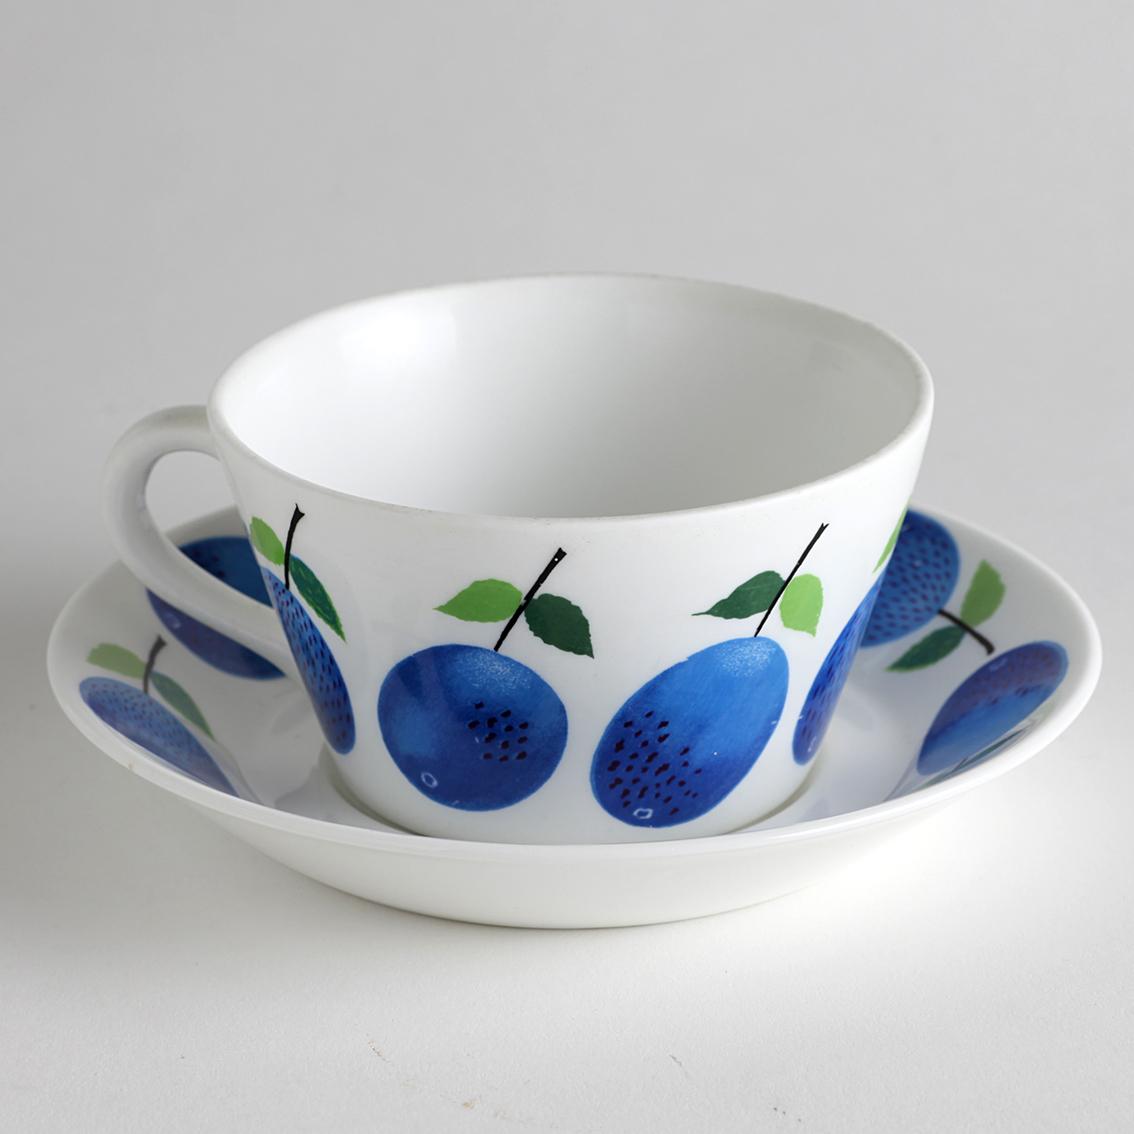 Gustavsberg グスタフスベリ Prunus プルーヌス ティーカップ&ソーサー-5 北欧ヴィンテージ